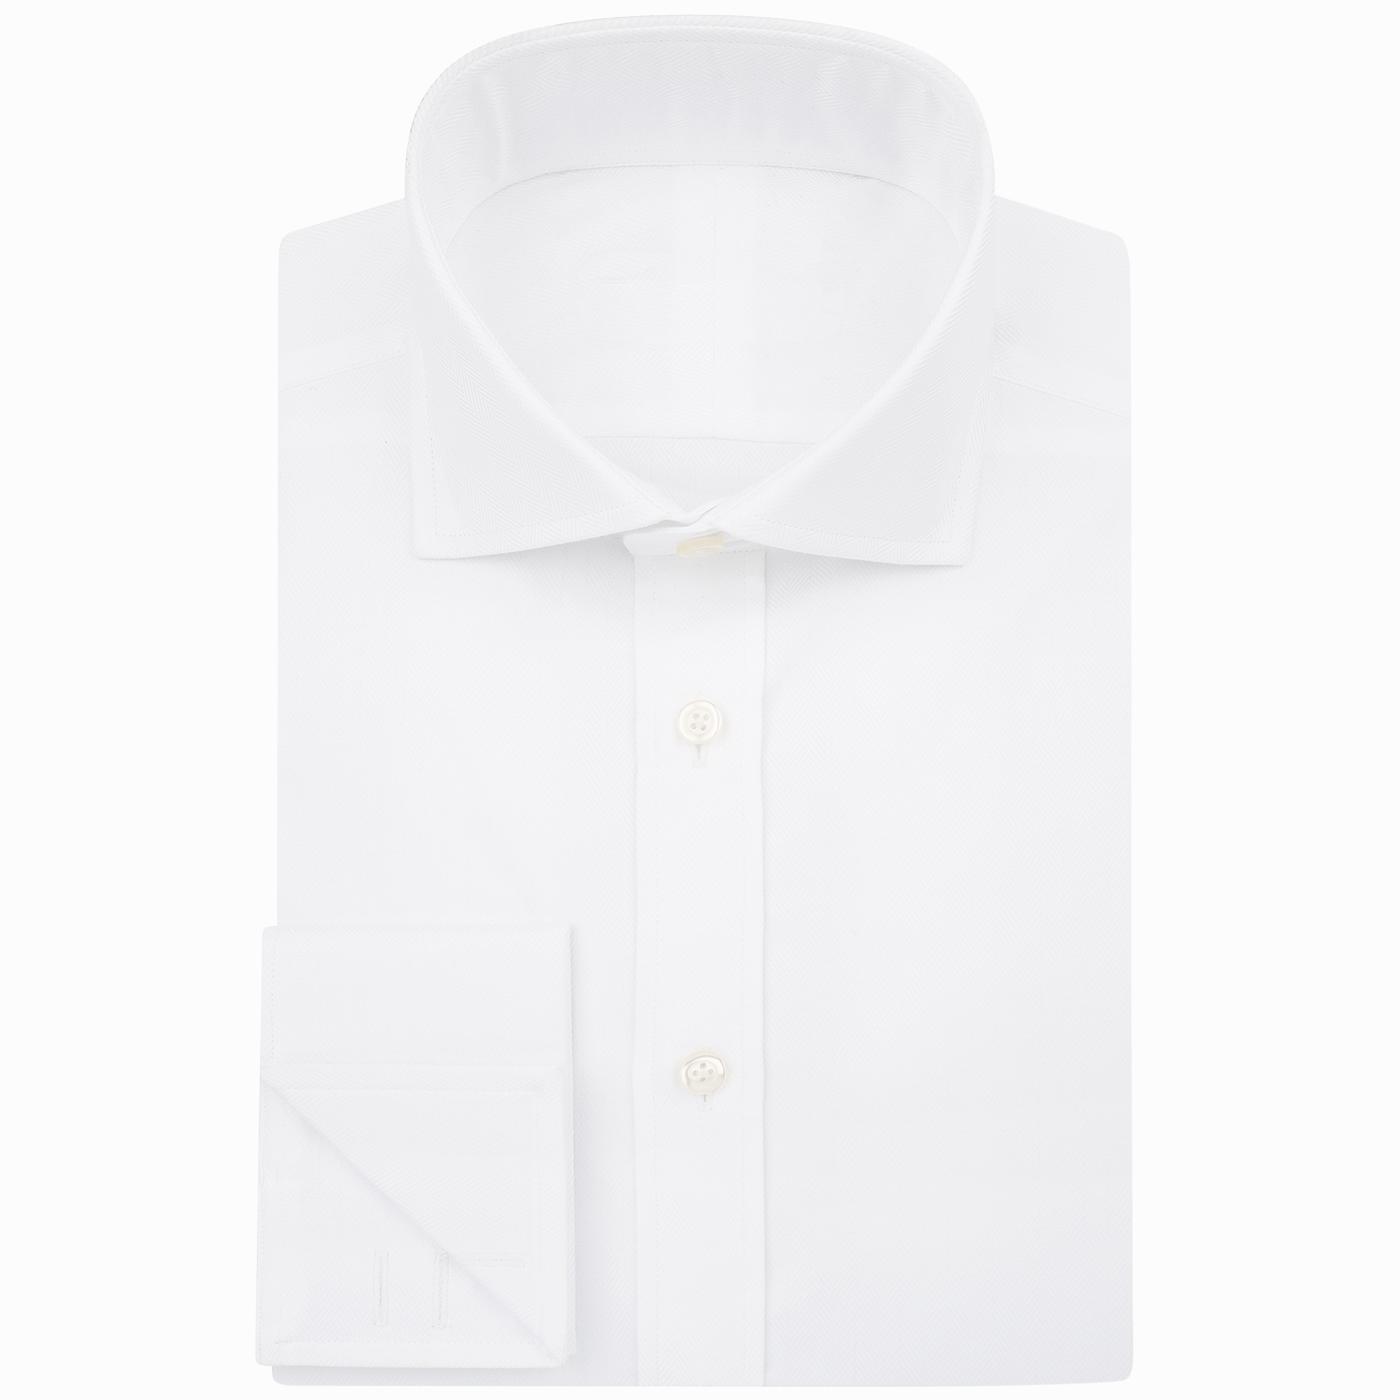 Shirt_9_Club-poplin_white.jpg